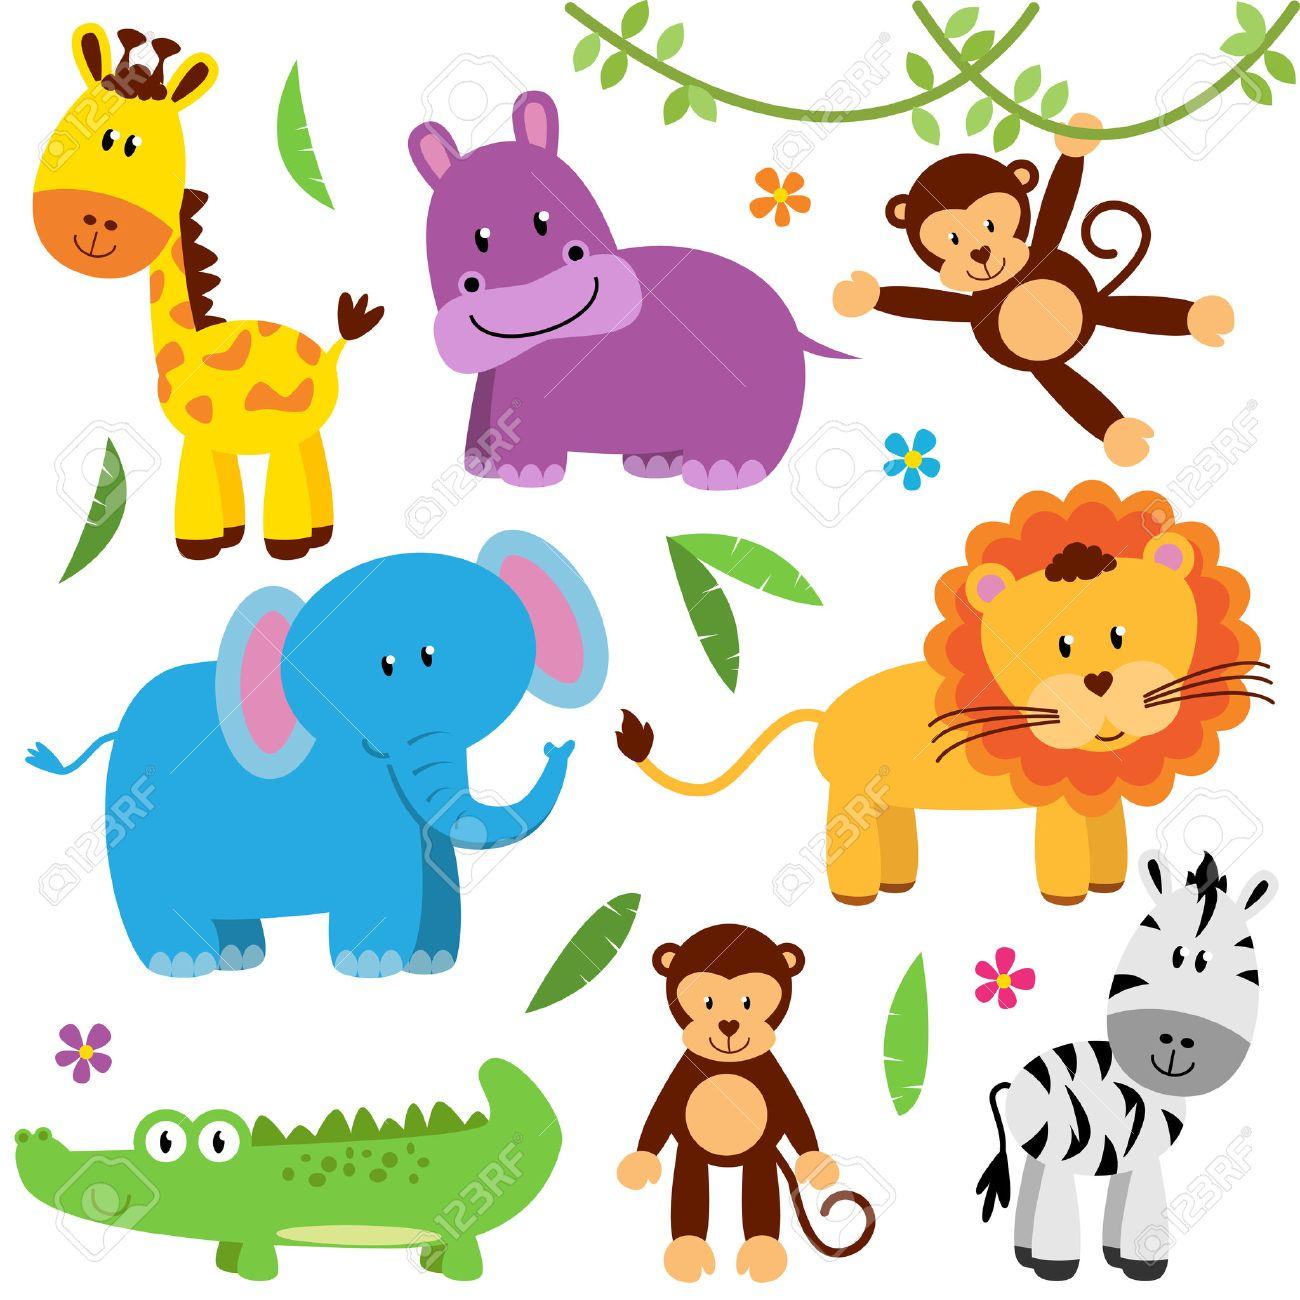 Cute Vector Set of Zoo Animals Stock Vector - 40603591